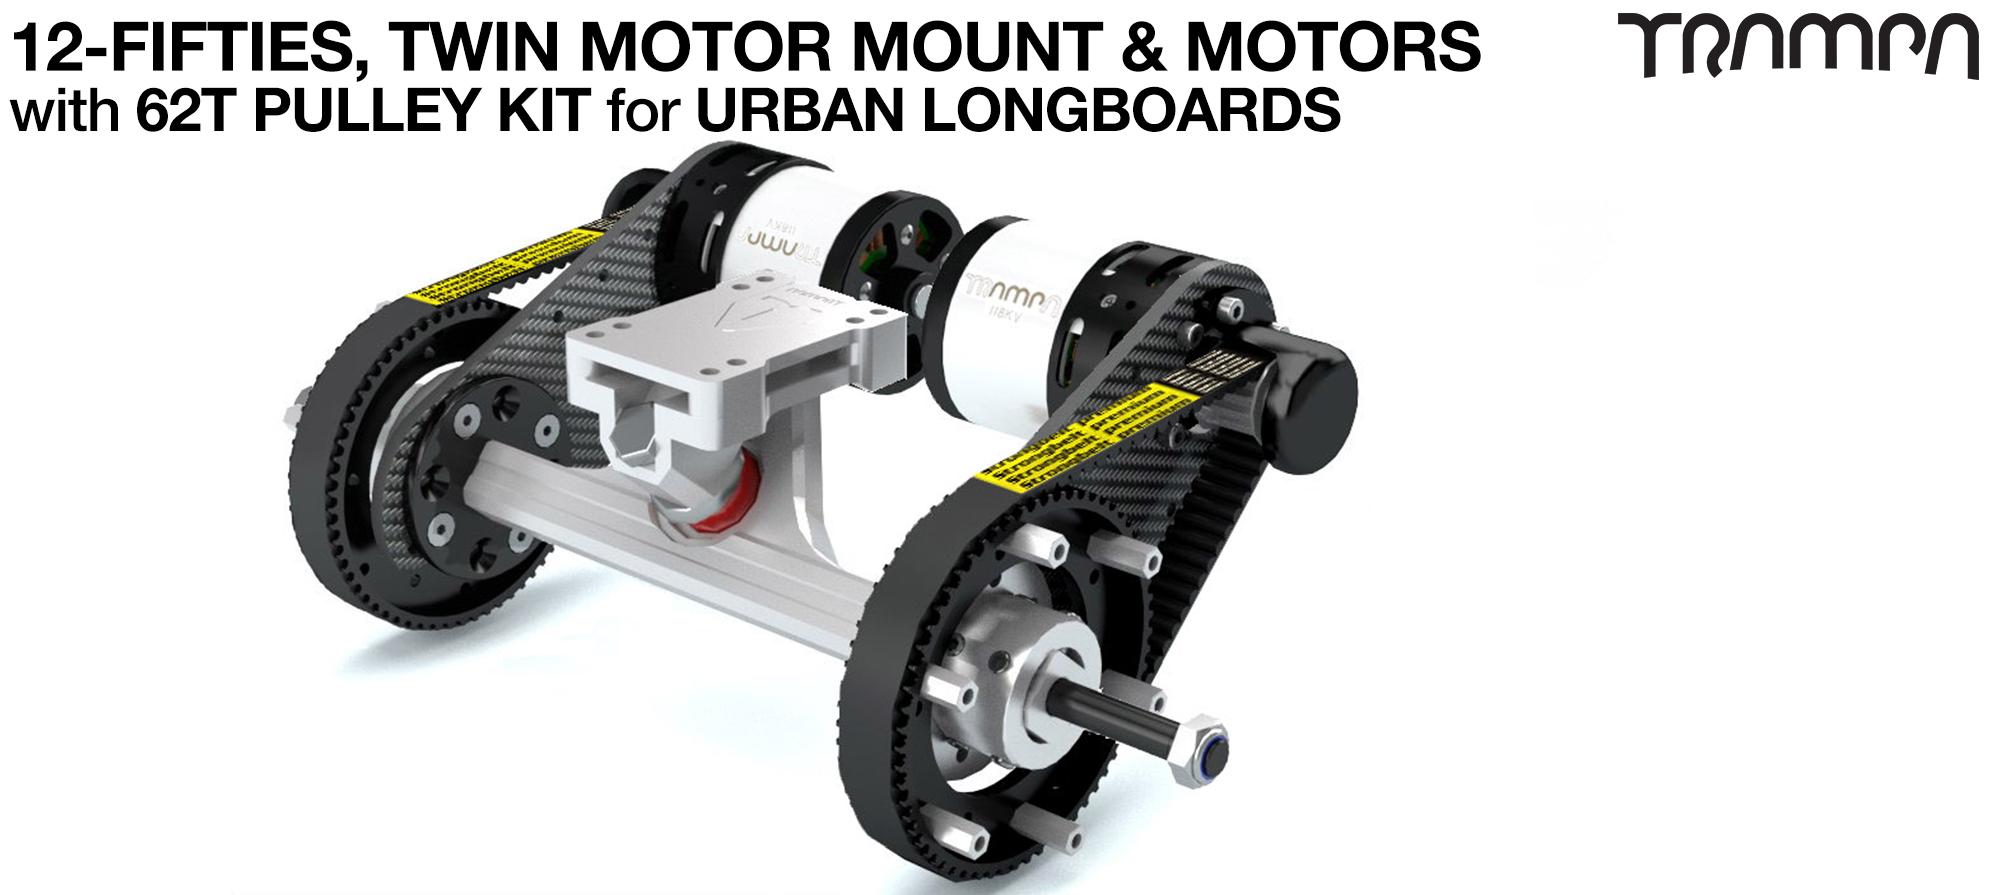 Original 12FiFties Motor Mount with 62 Tooth URBAN  Pulley Kit & Motor & 2x 12FiFties Trucks - TWIN